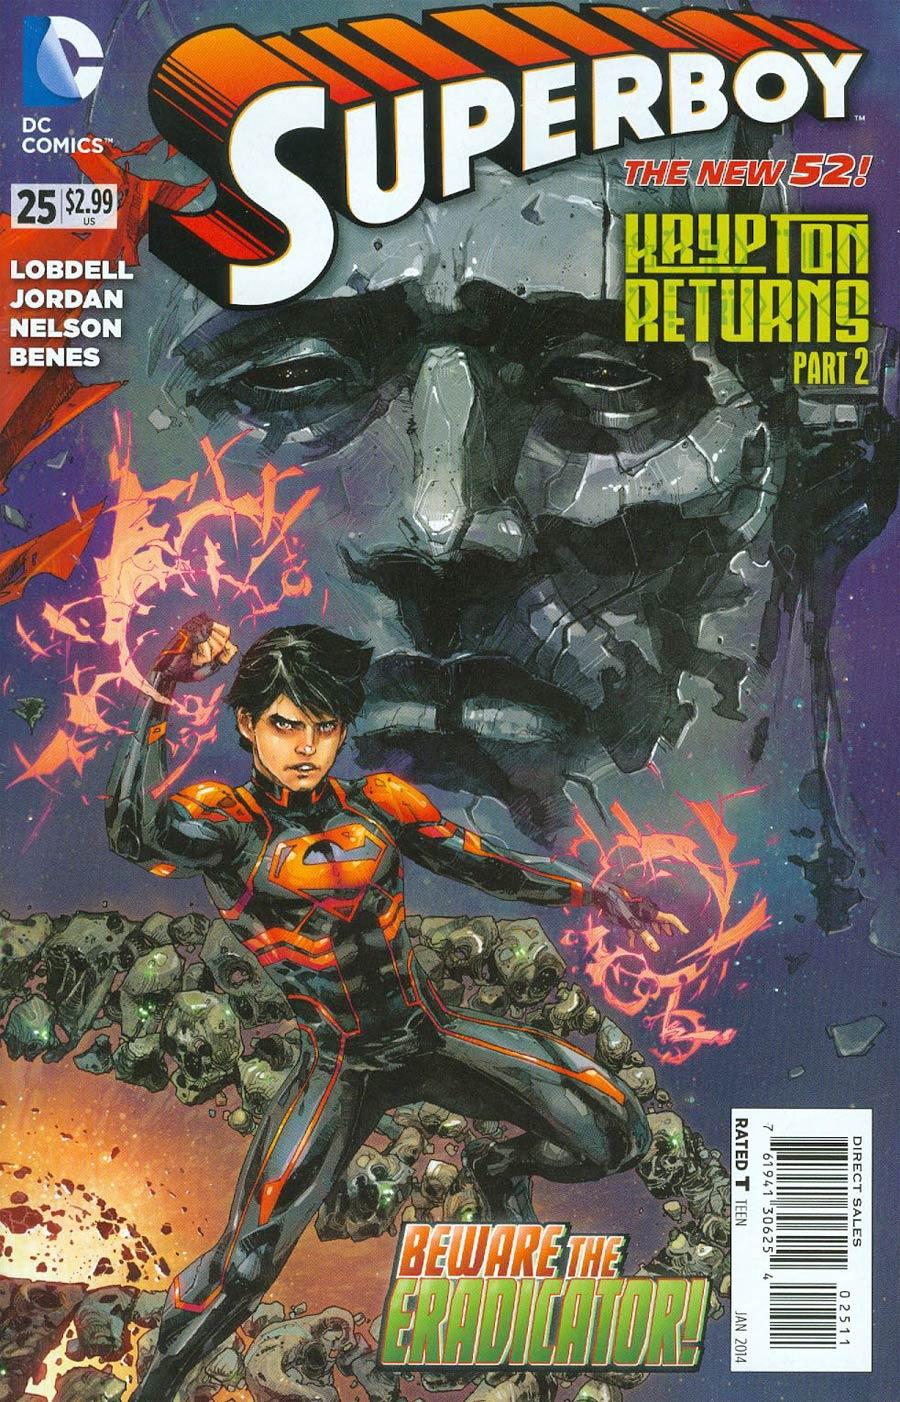 Superboy Vol 5 #25 (Krypton Returns Tie-In)